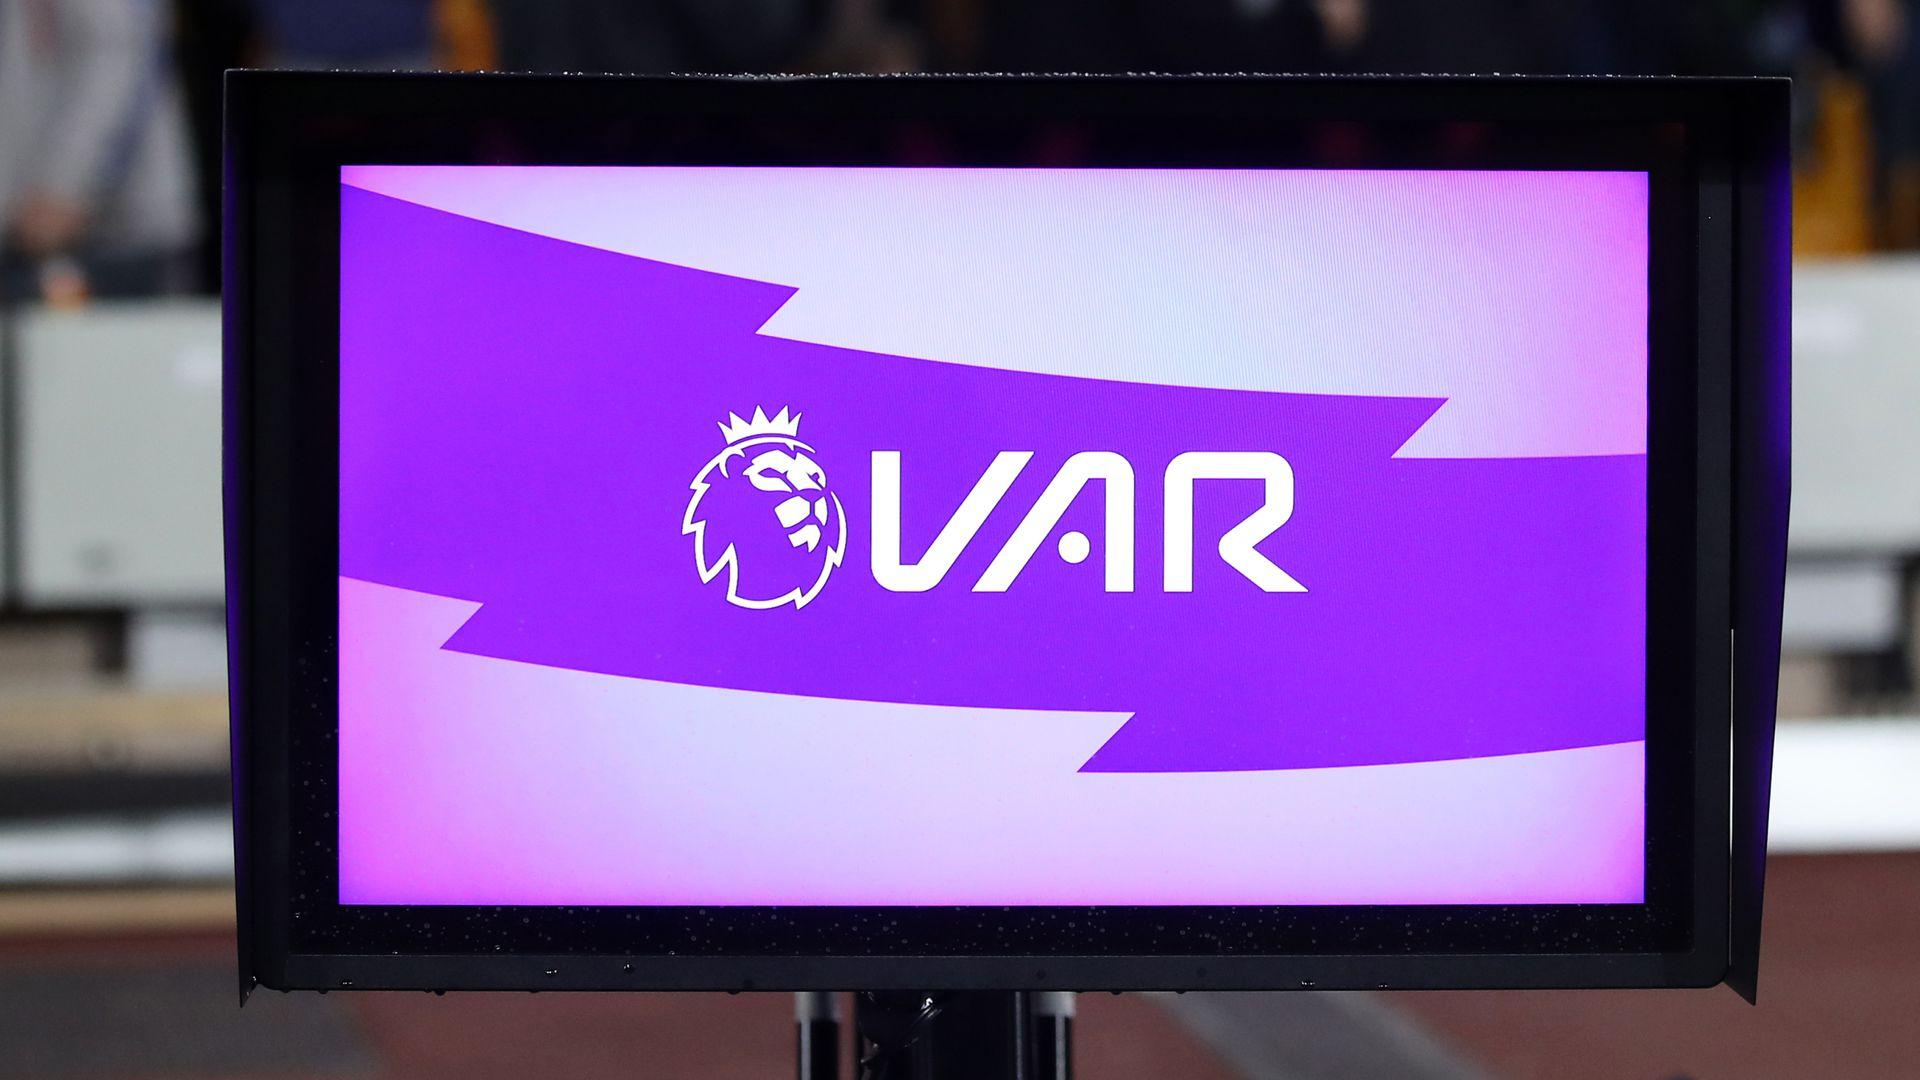 FIFA takes full control of VAR